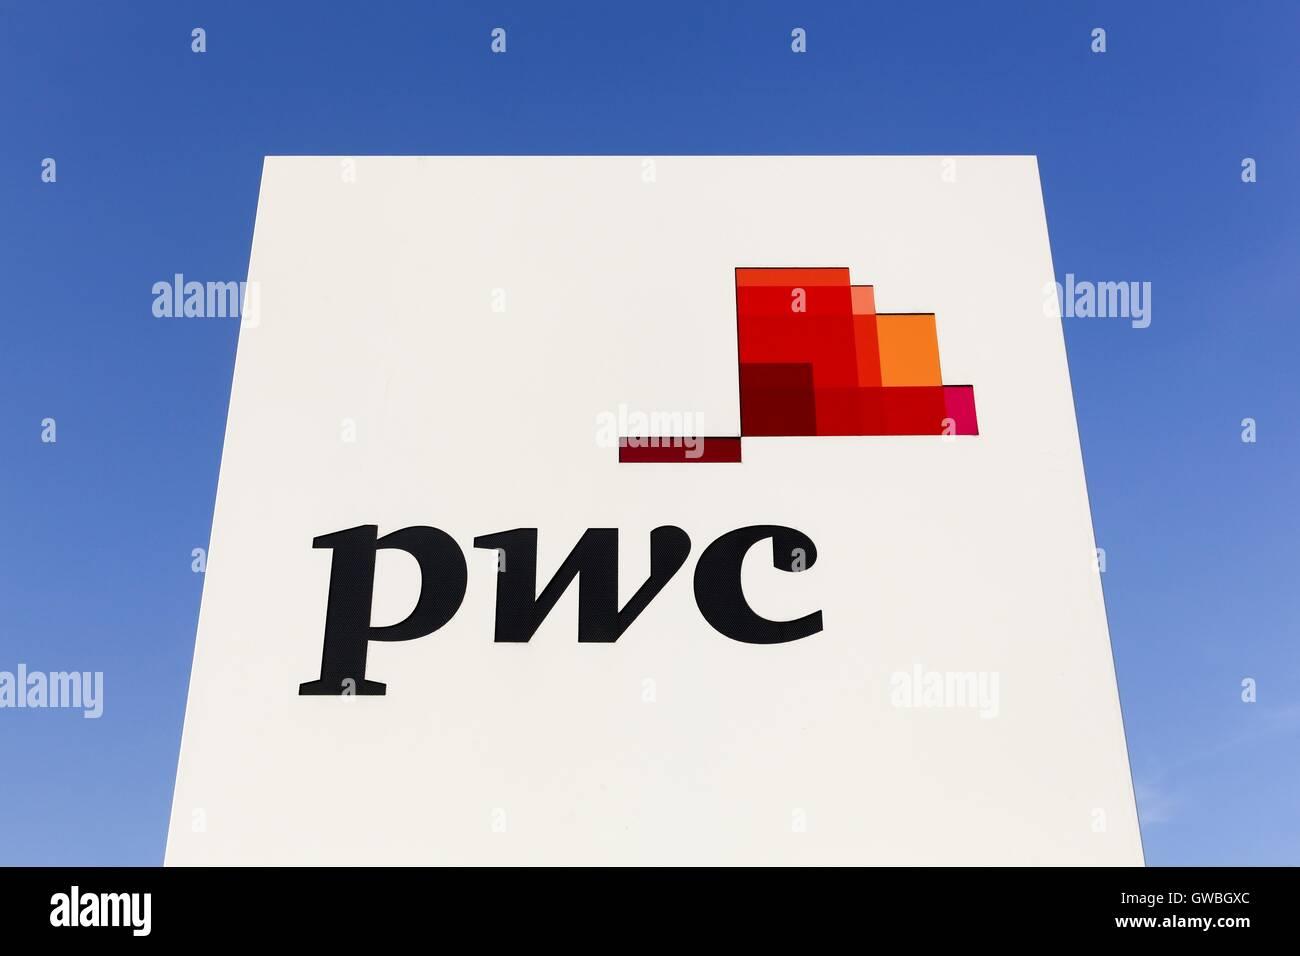 PWC logo on a wall - Stock Image